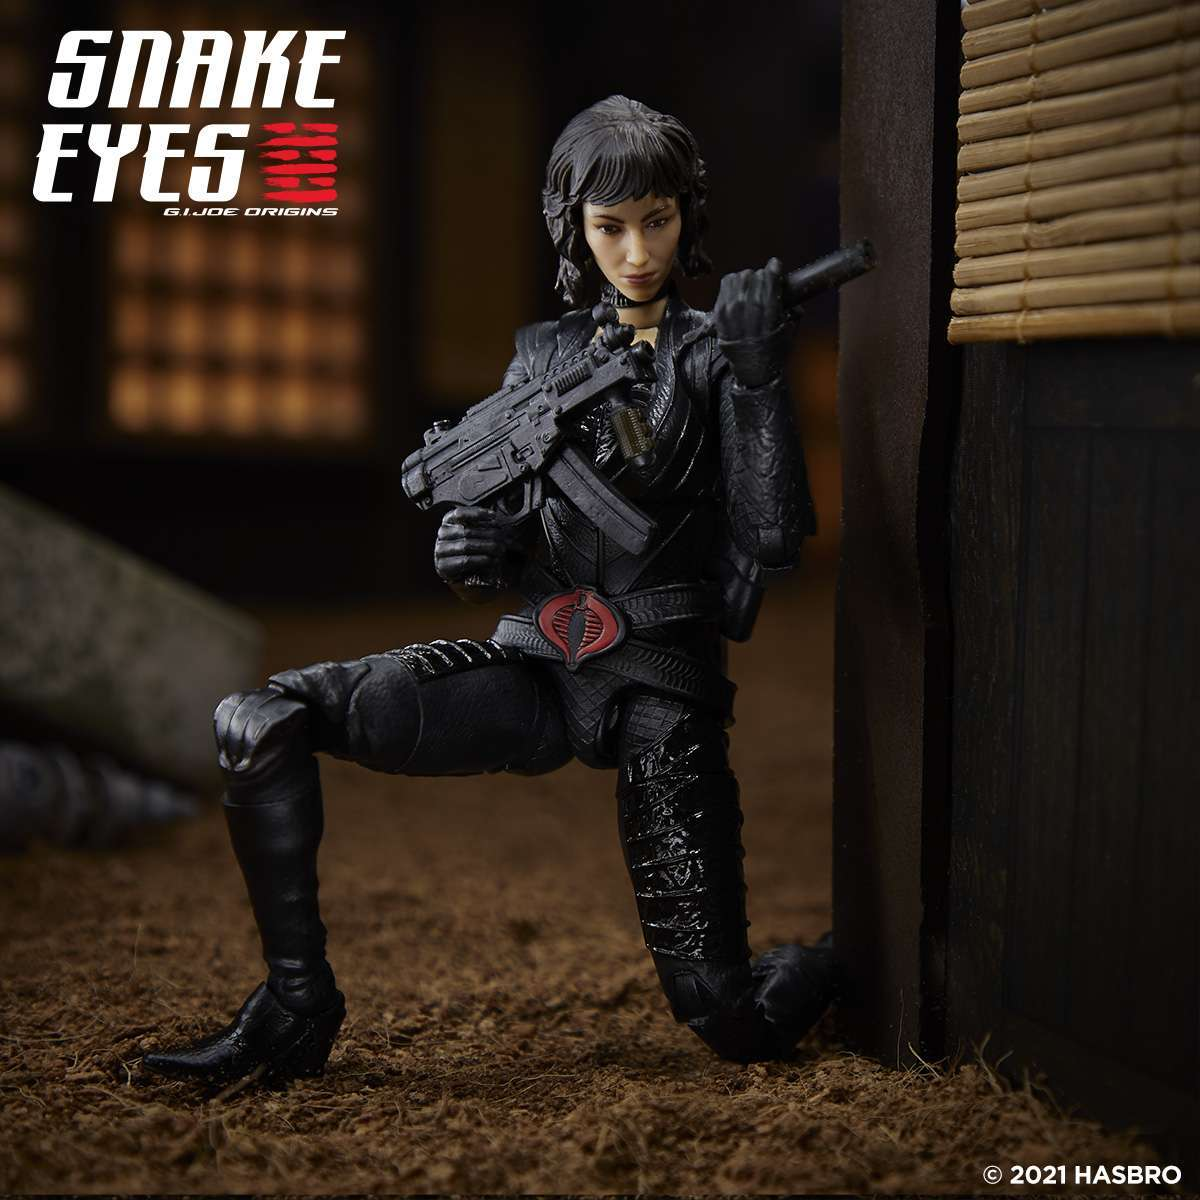 GIJ CS Snake Eyes Baroness 2